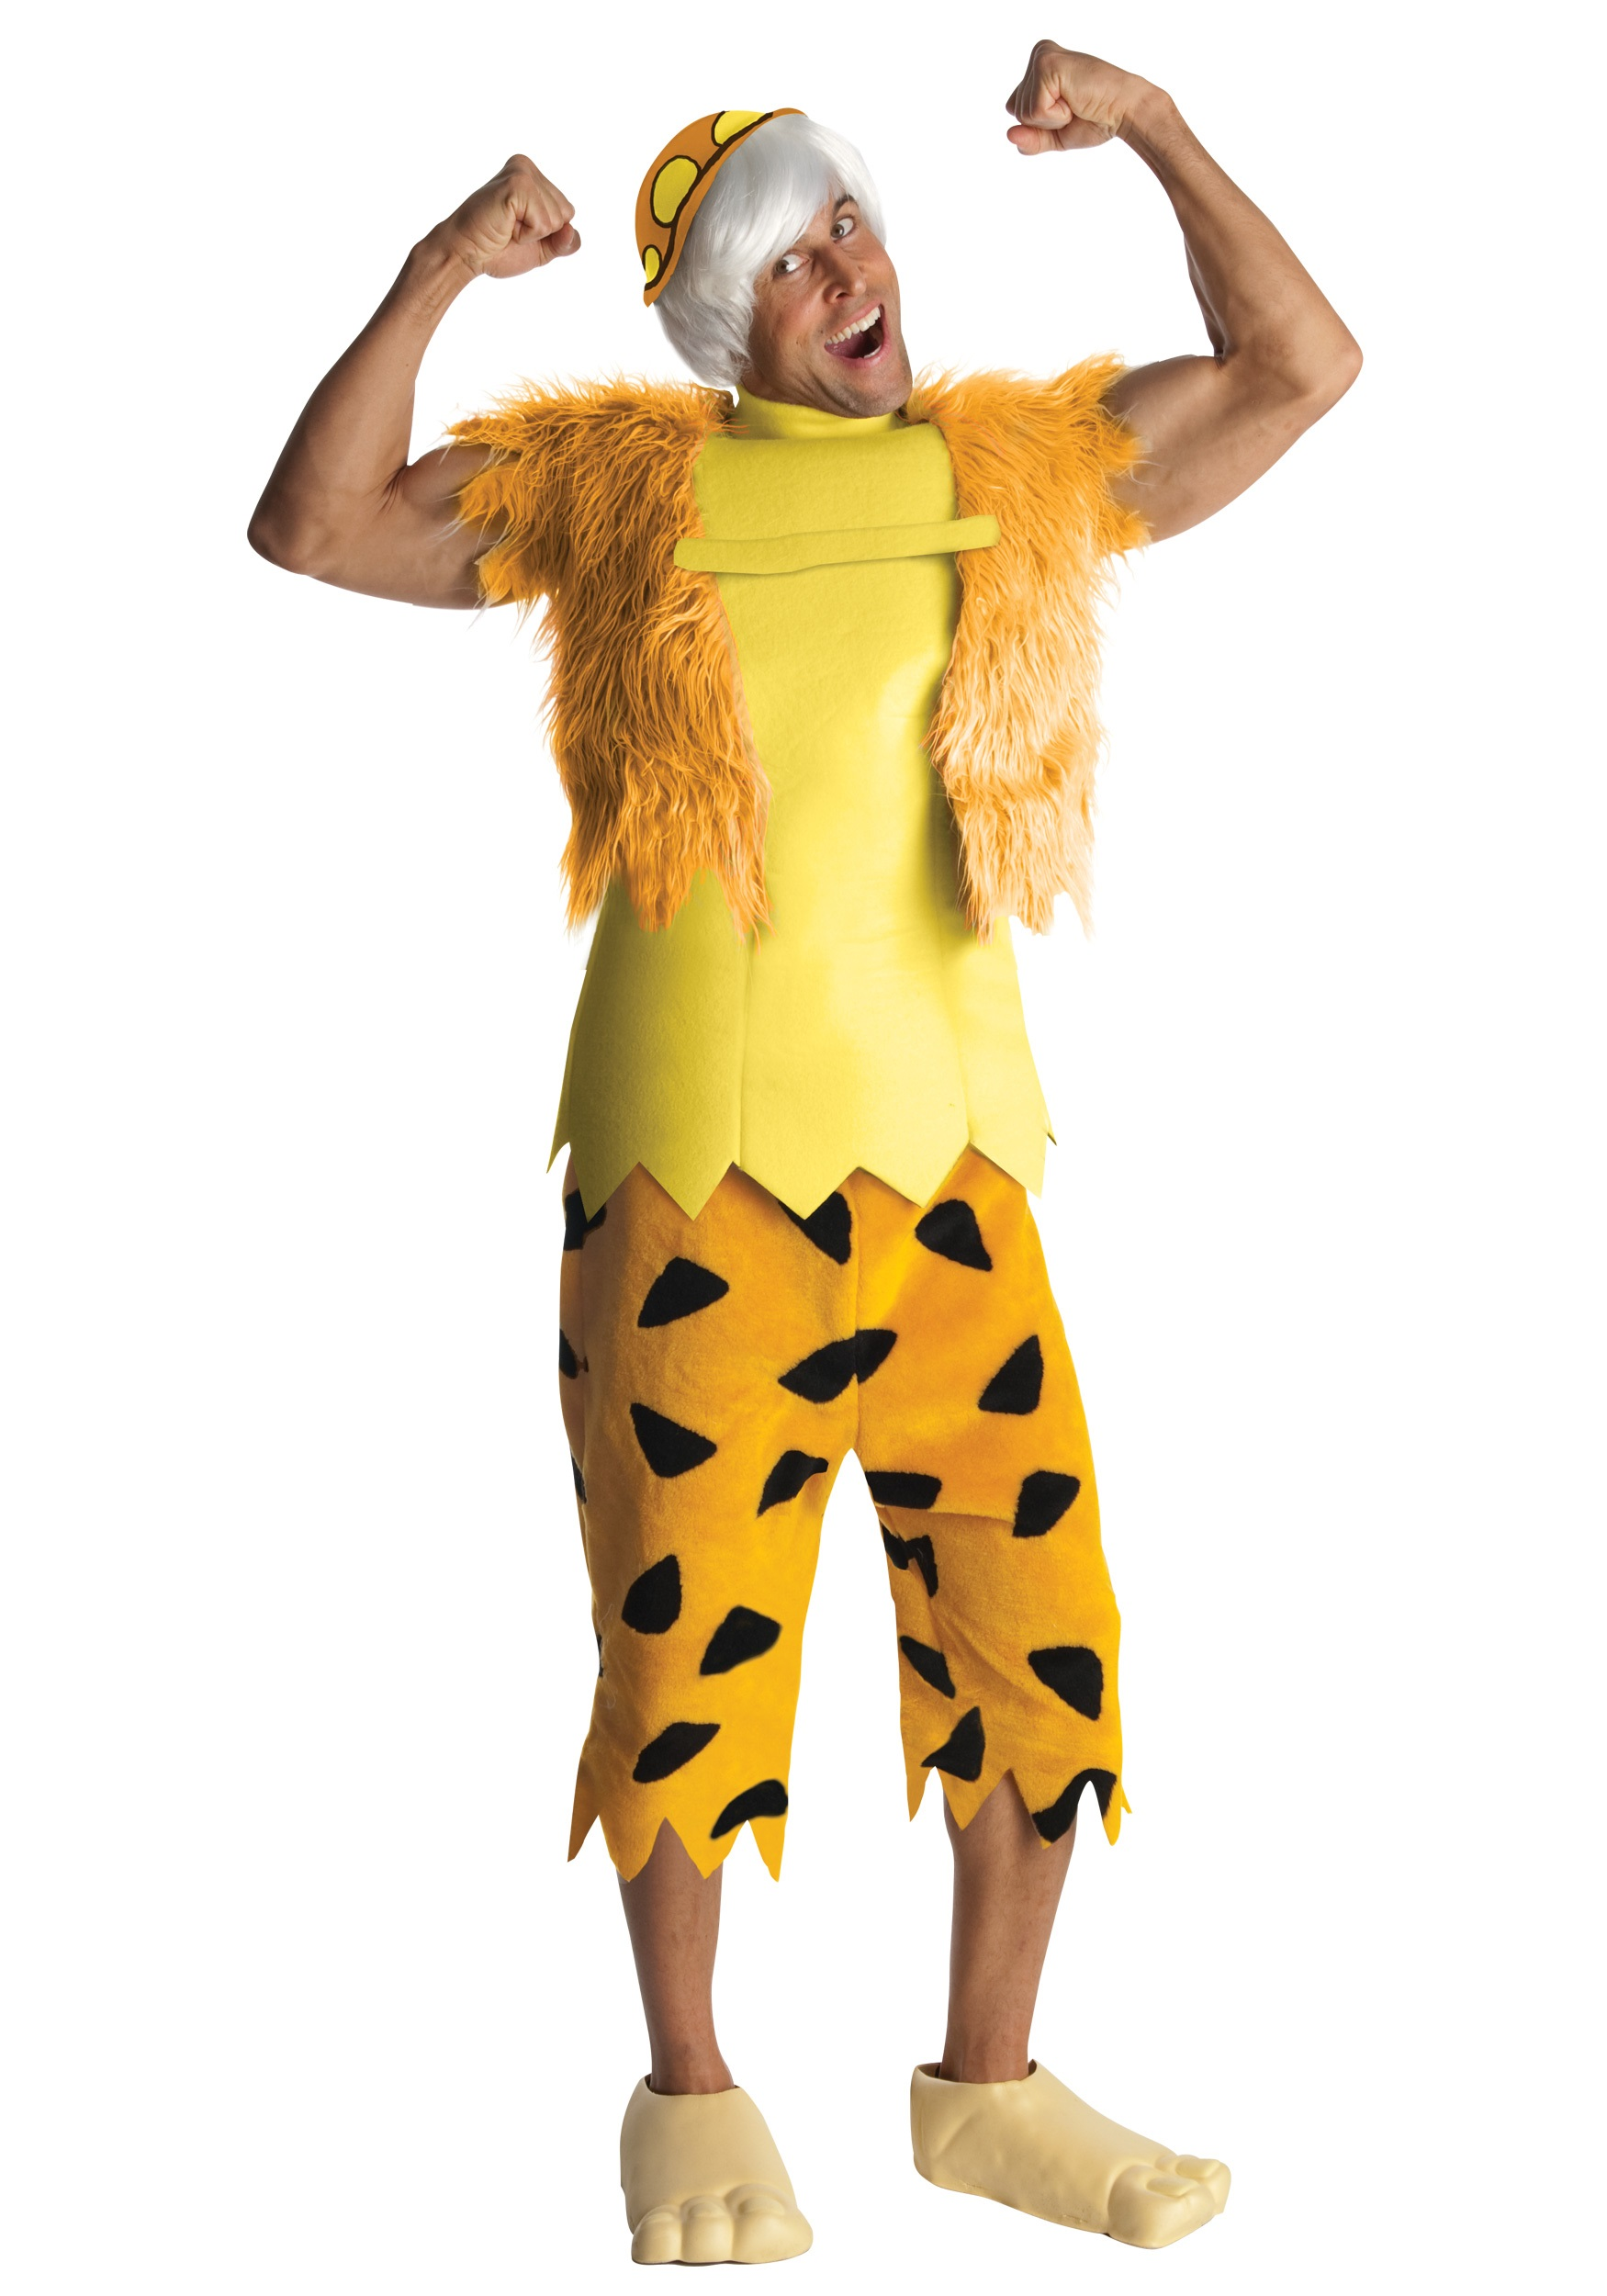 Think, Adult flintstone costume